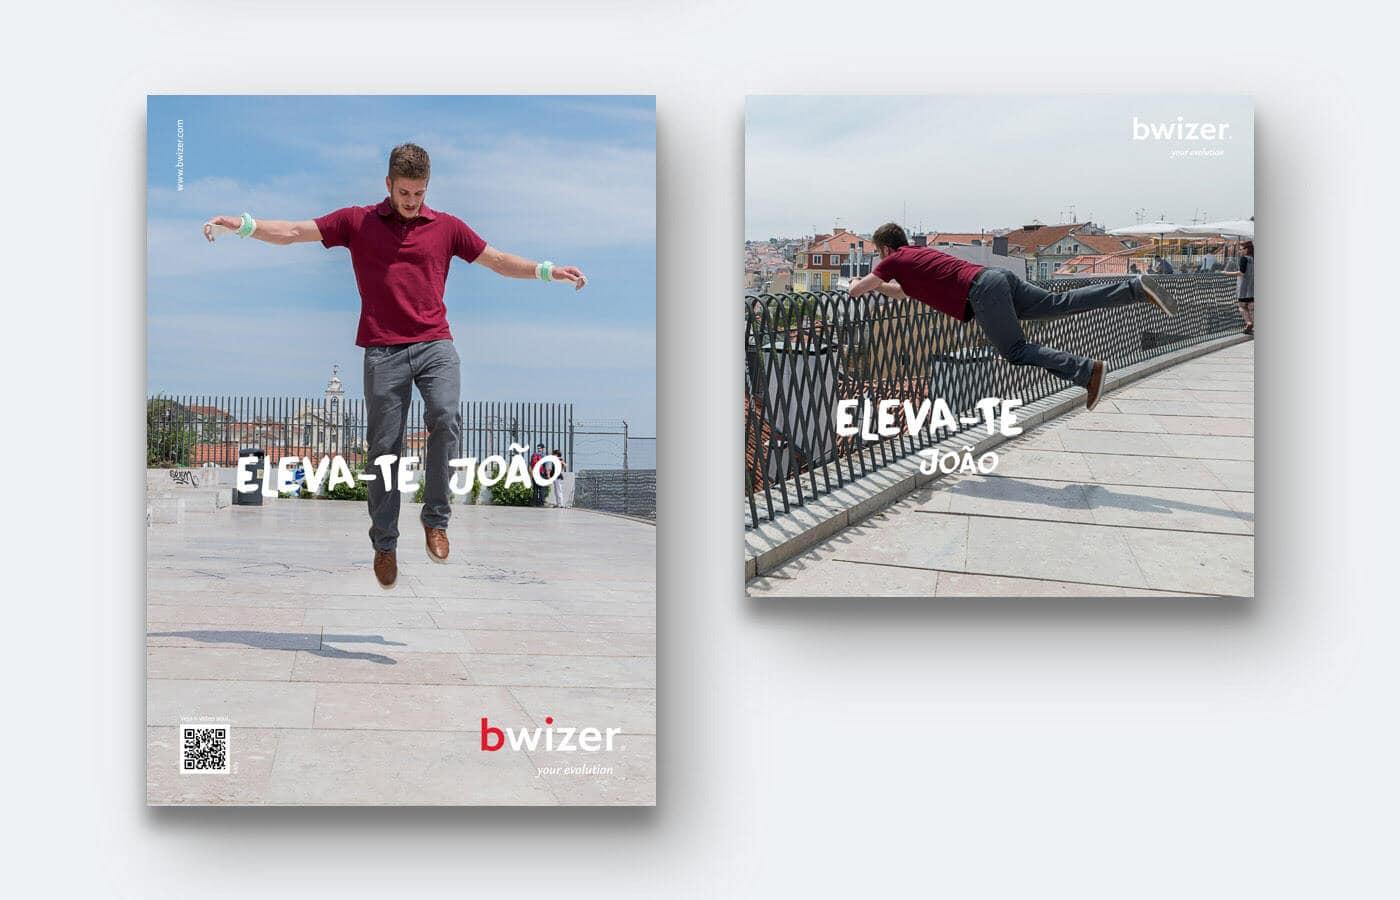 Bwizer - Rise Up